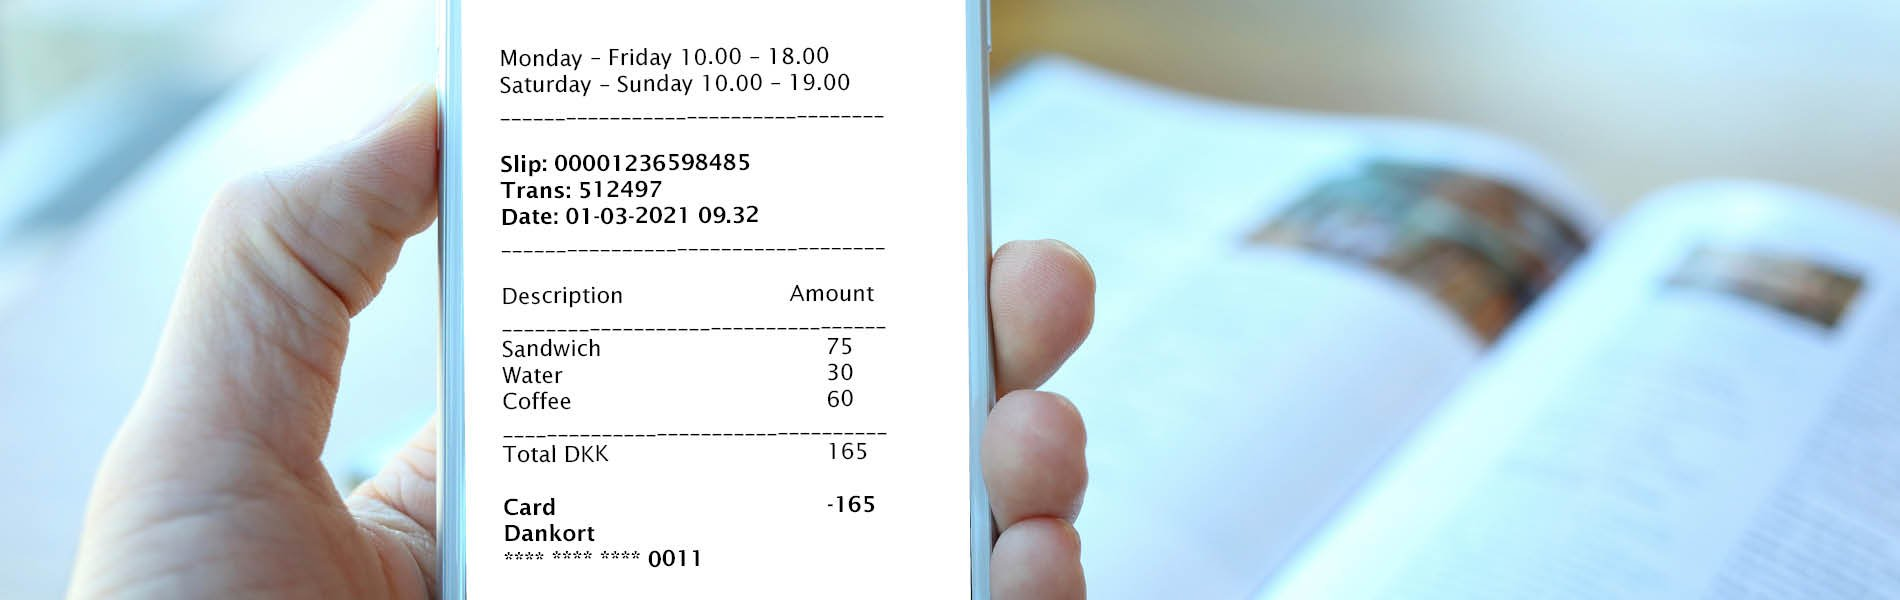 Continia Expense Management 365